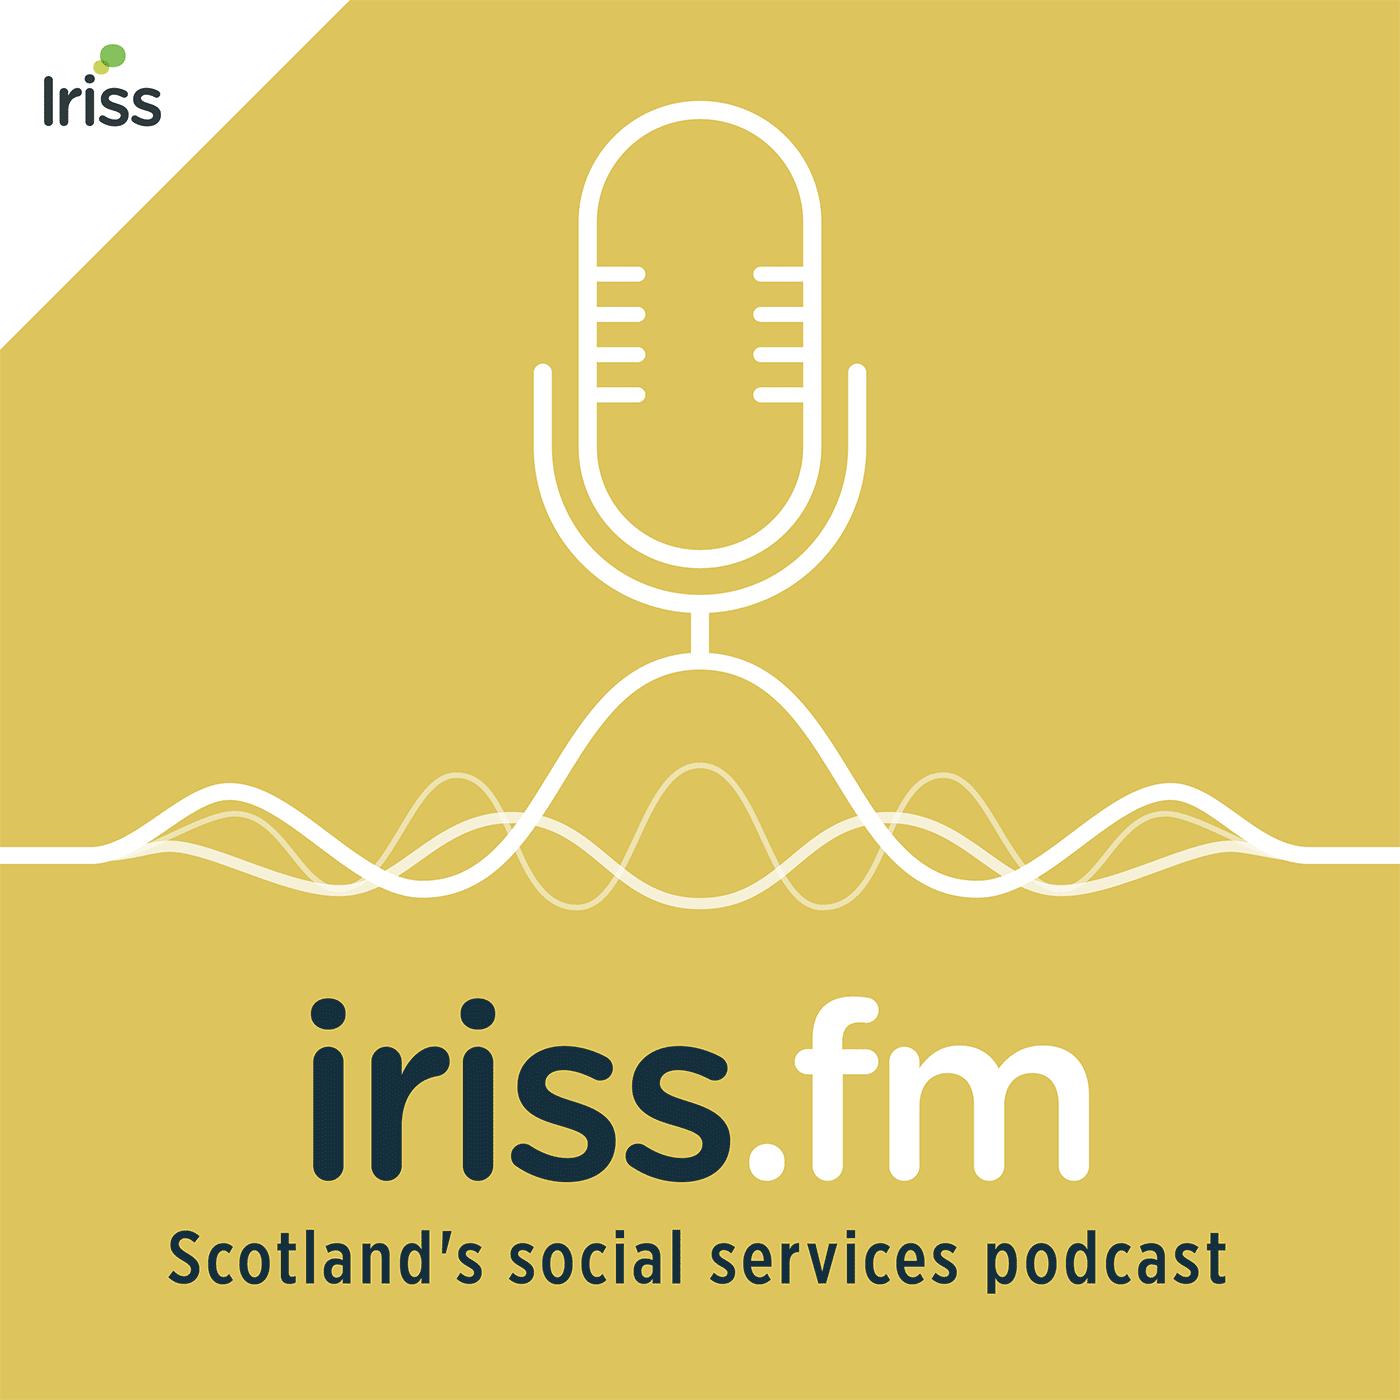 Iriss.fm, Scotland's social services podcast show art